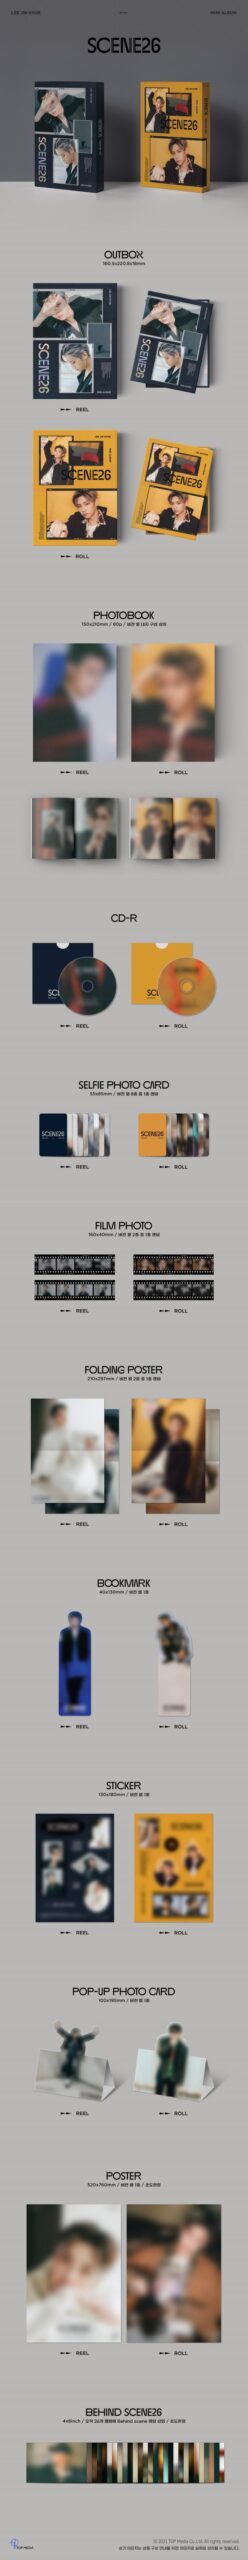 LEE JIN HYUK 3nd Mini SCENE26 Poster